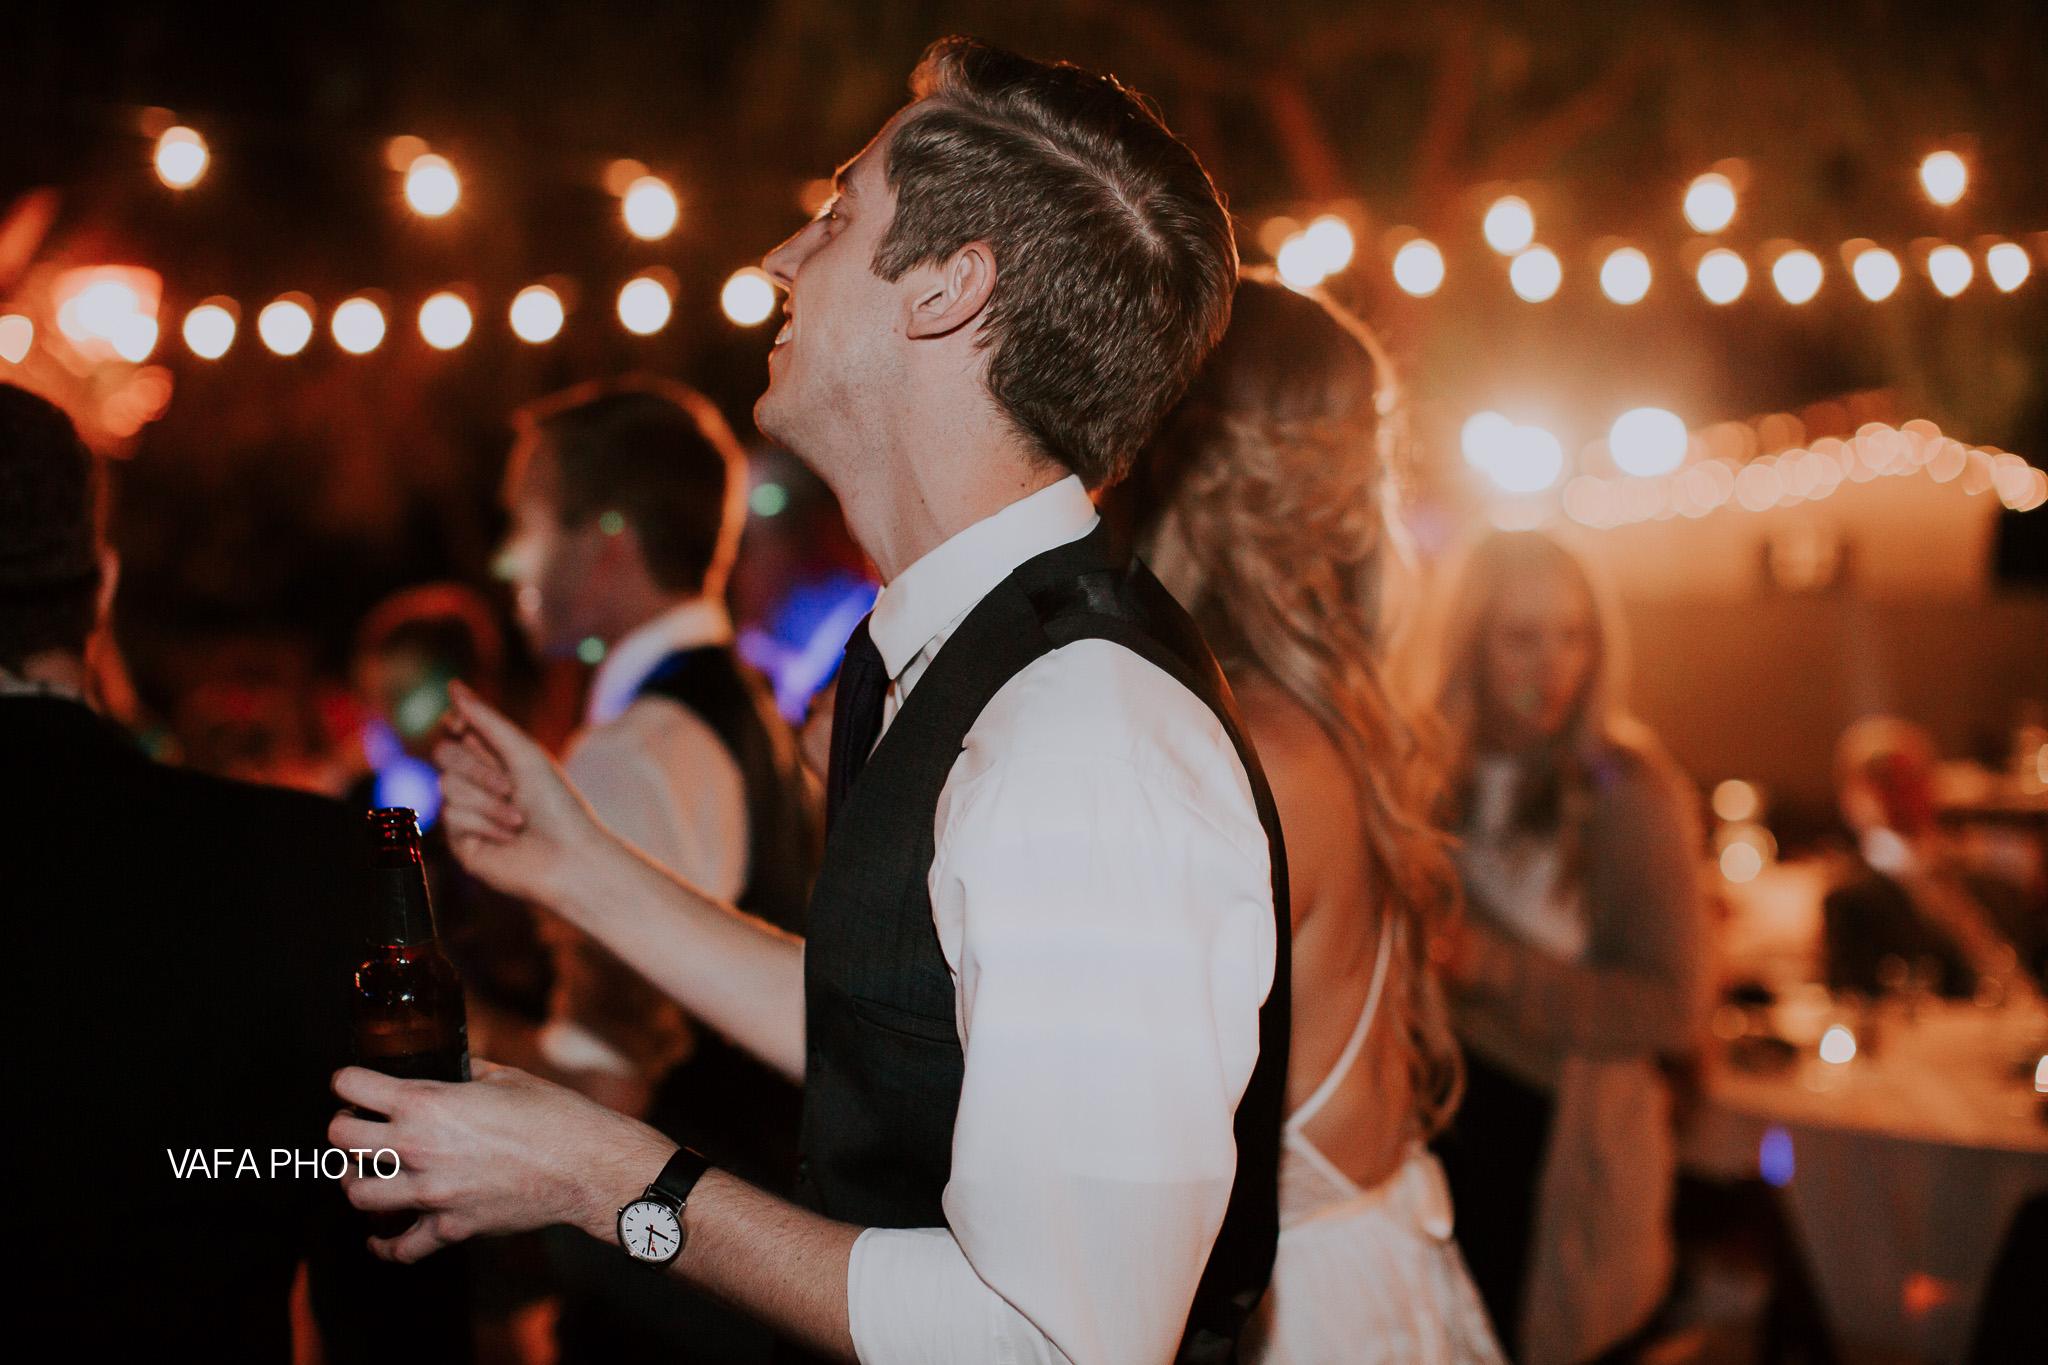 Leo-Carrillo-Ranch-Wedding-Lauren-Mike-Vafa-Photo-1199.jpg